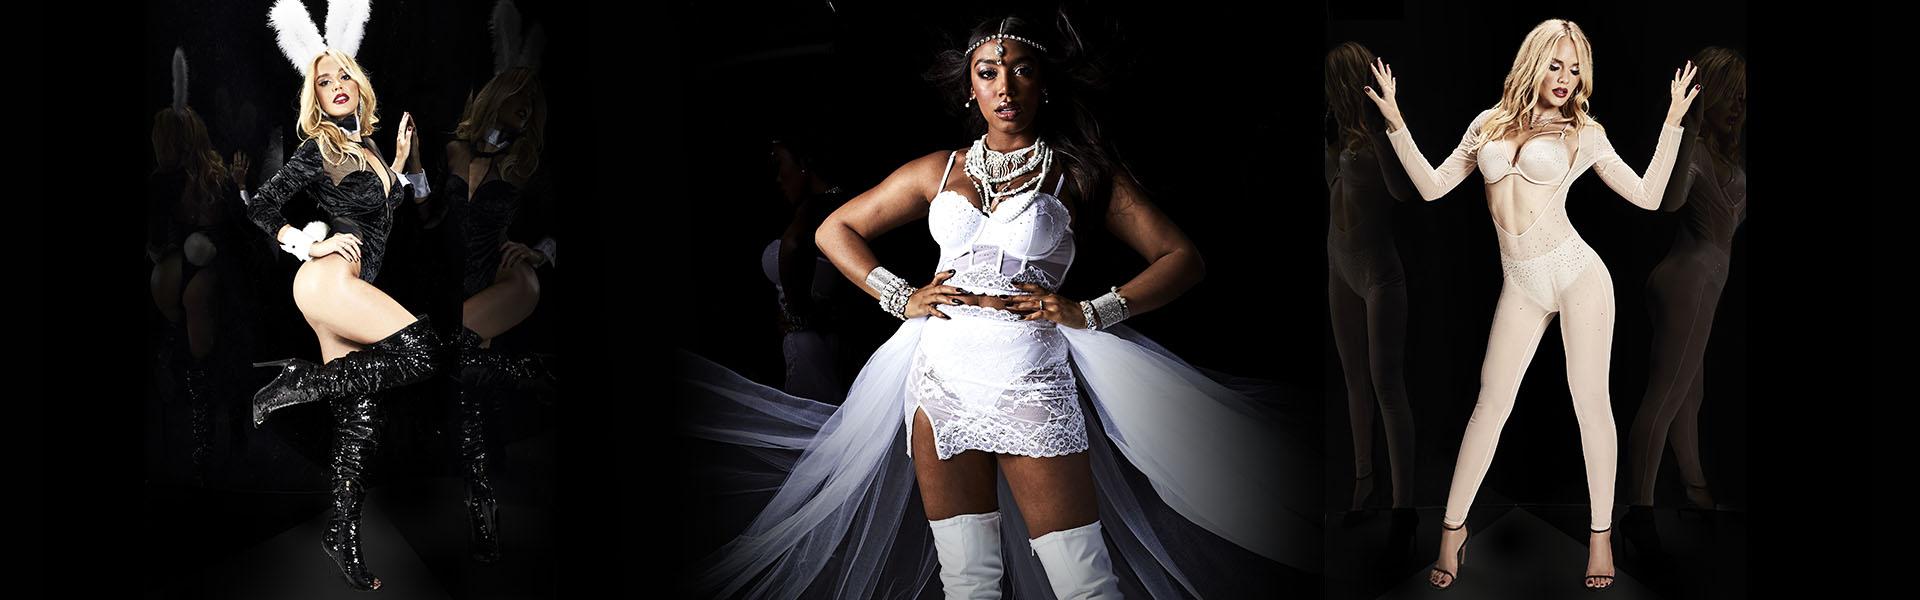 La Senza Halloween. Dark bunny suit, white lace bride costume, and the kylie jenner bodysuit.